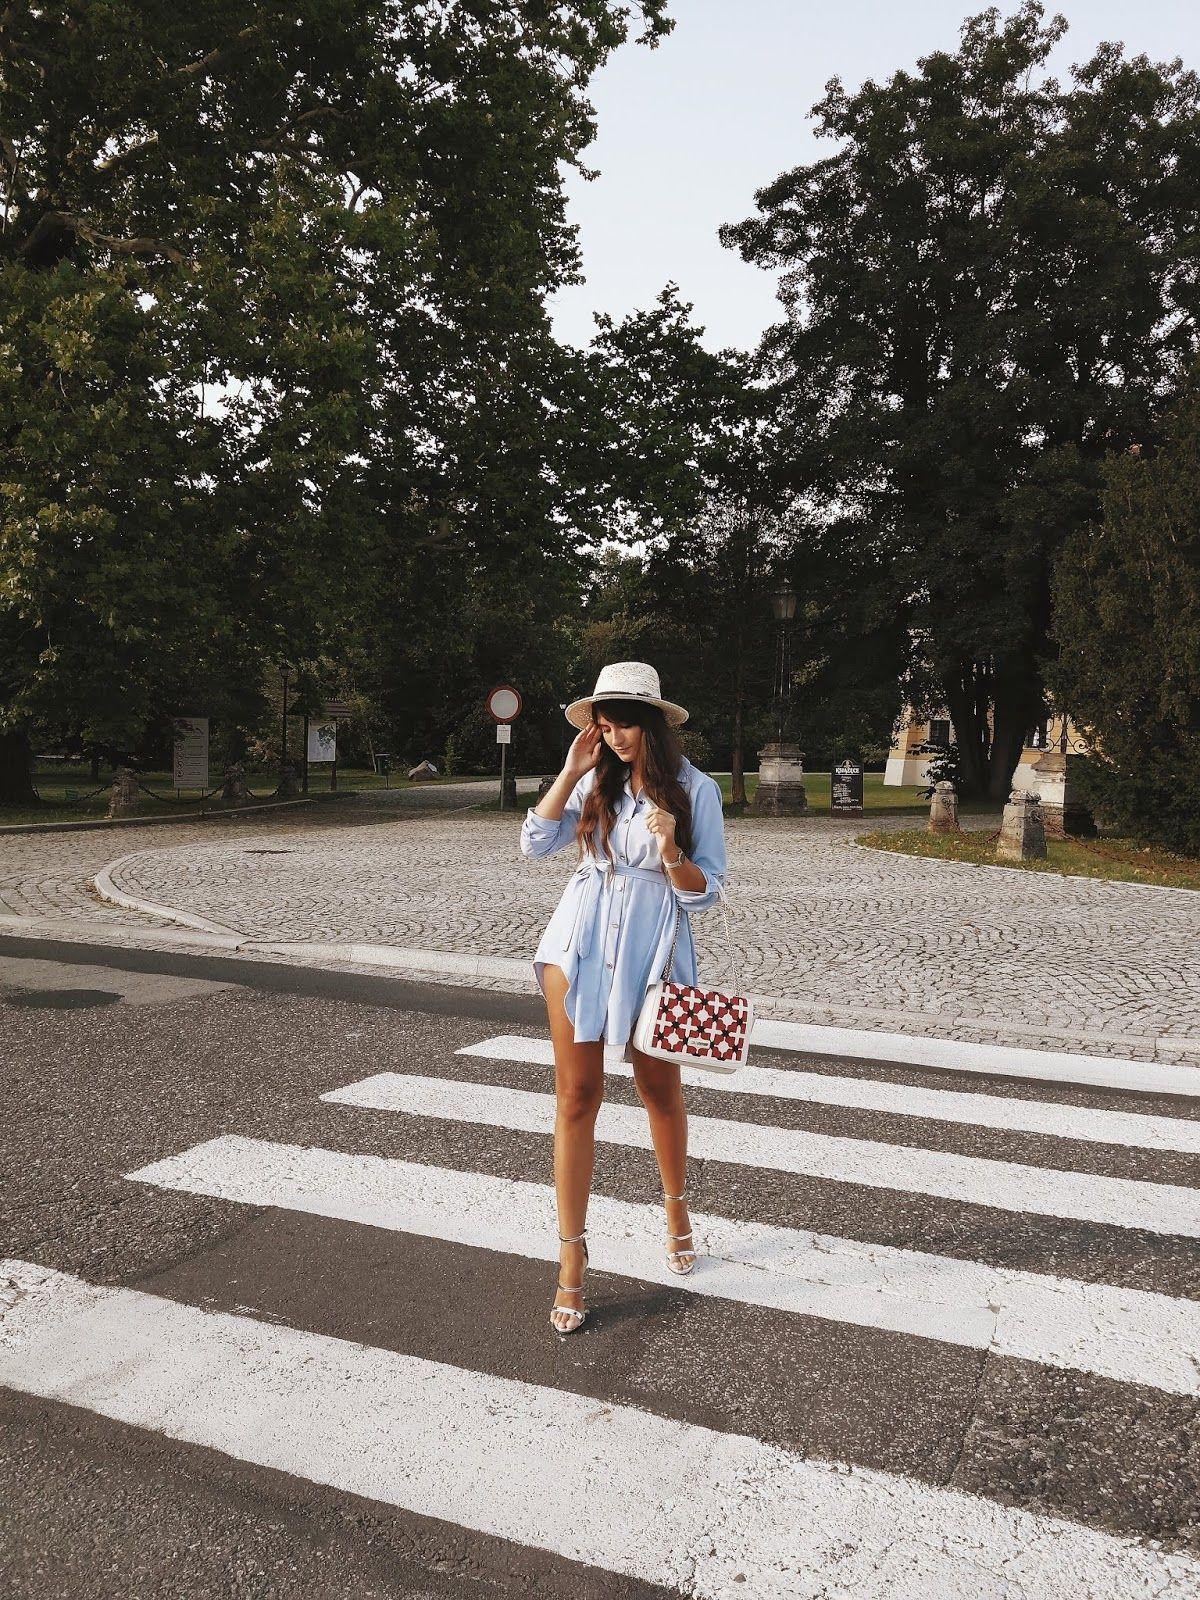 Blue Shirt Dress Outfit Silver Higheels Outfit Love Moschino Handbag Summer Style Inspo Shirt Dress Outfit Blue Shirt Dress Fashion Inspo